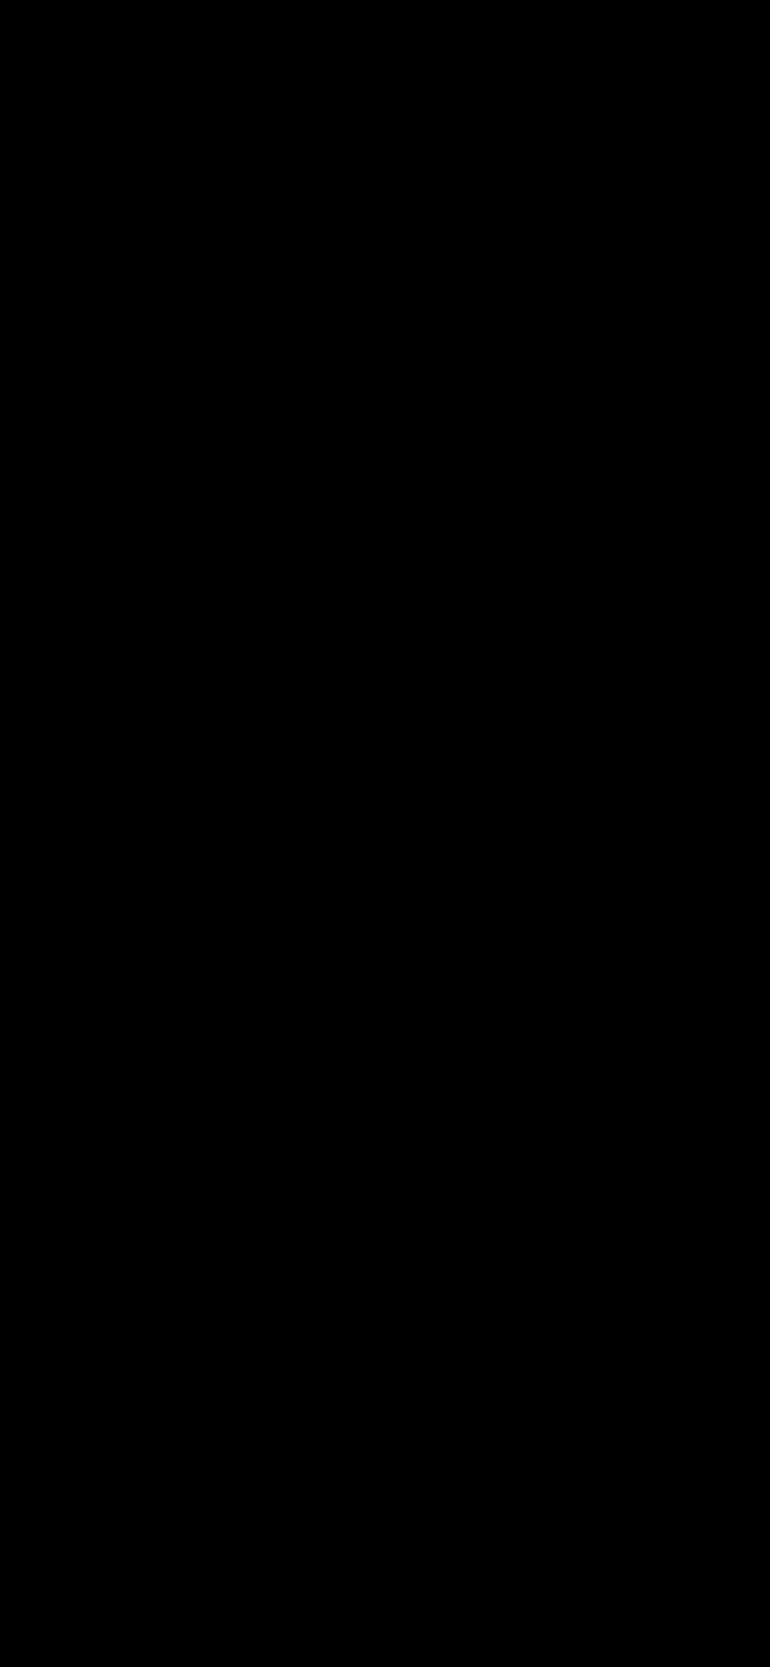 Siri Shortcuts - Connect AirPods